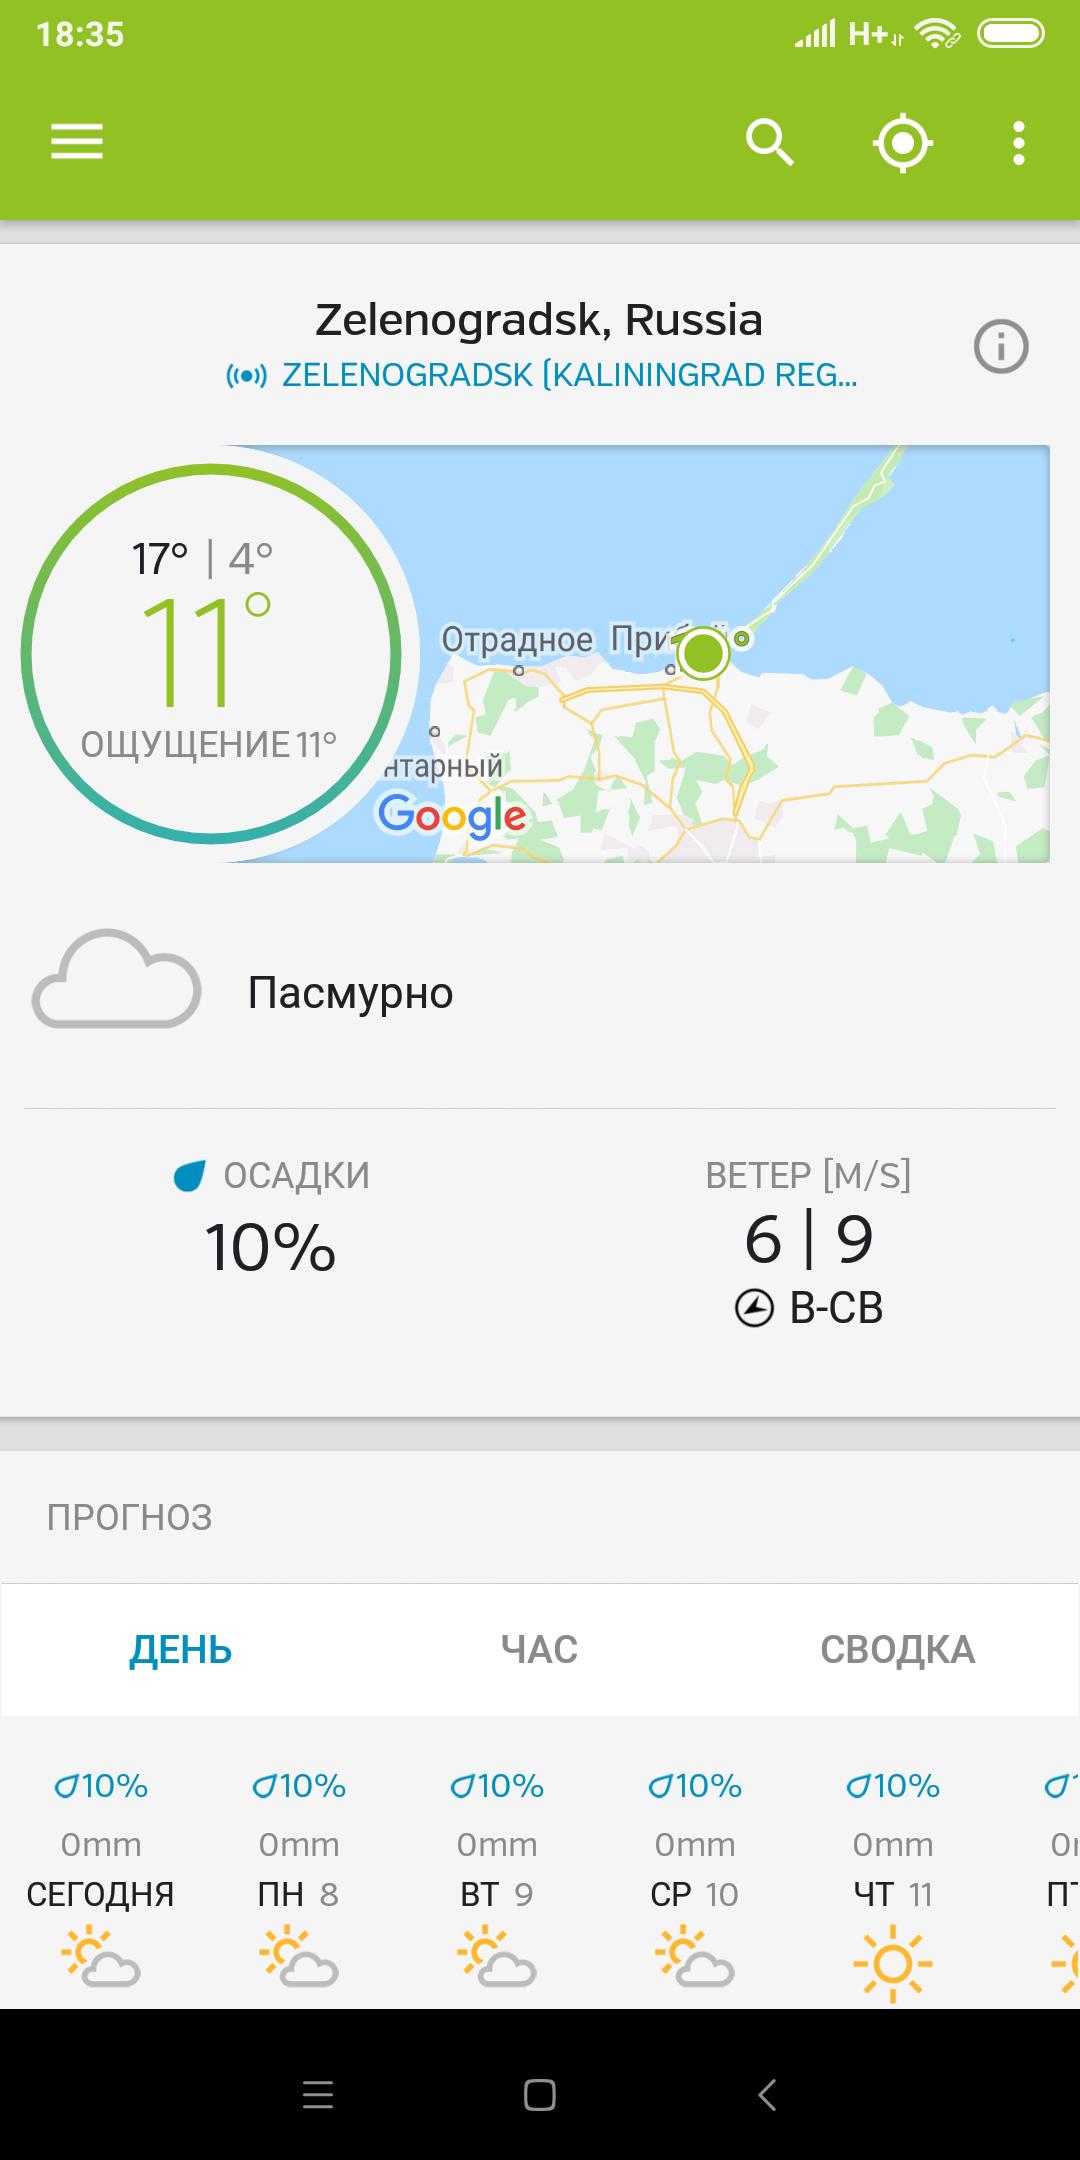 Нажмите на изображение для увеличения.  Название:Screenshot_2018-10-07-18-35-44-377_com.wunderground.android.weather.png Просмотров:0 Размер:182.5 Кб ID:219714